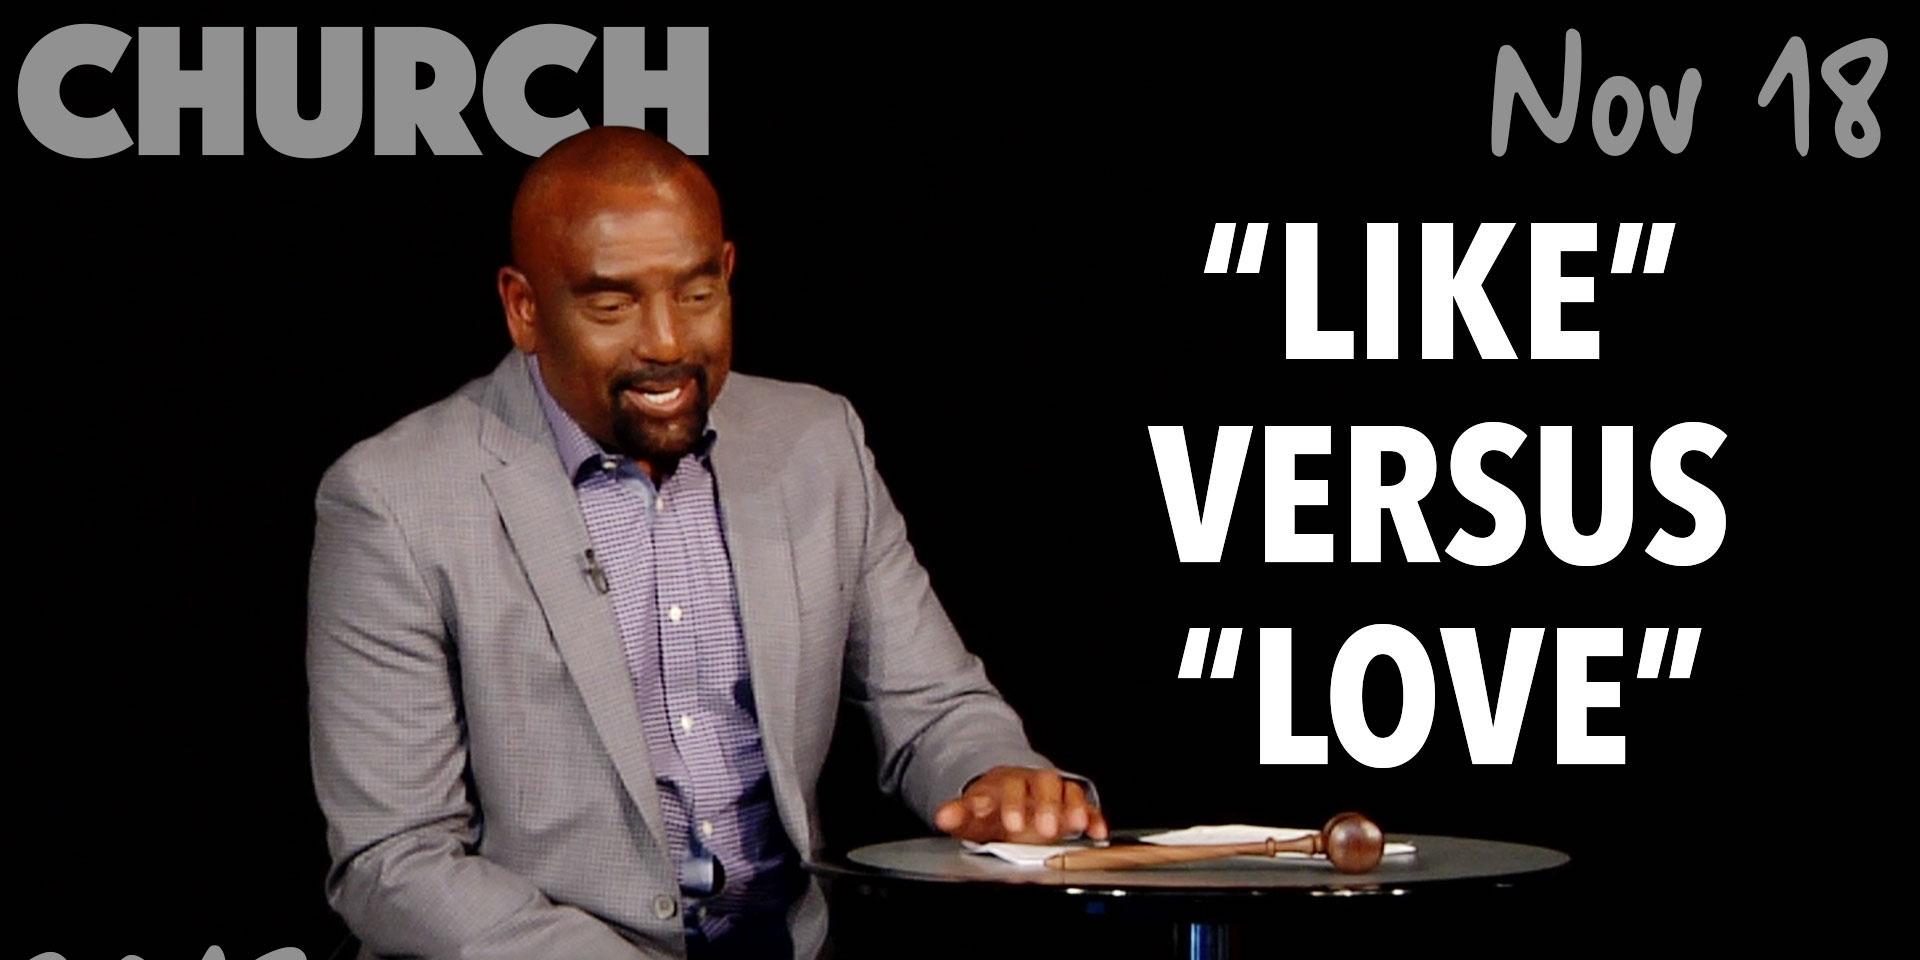 """Like"" Versus ""Love"" (Church, Nov 18)"